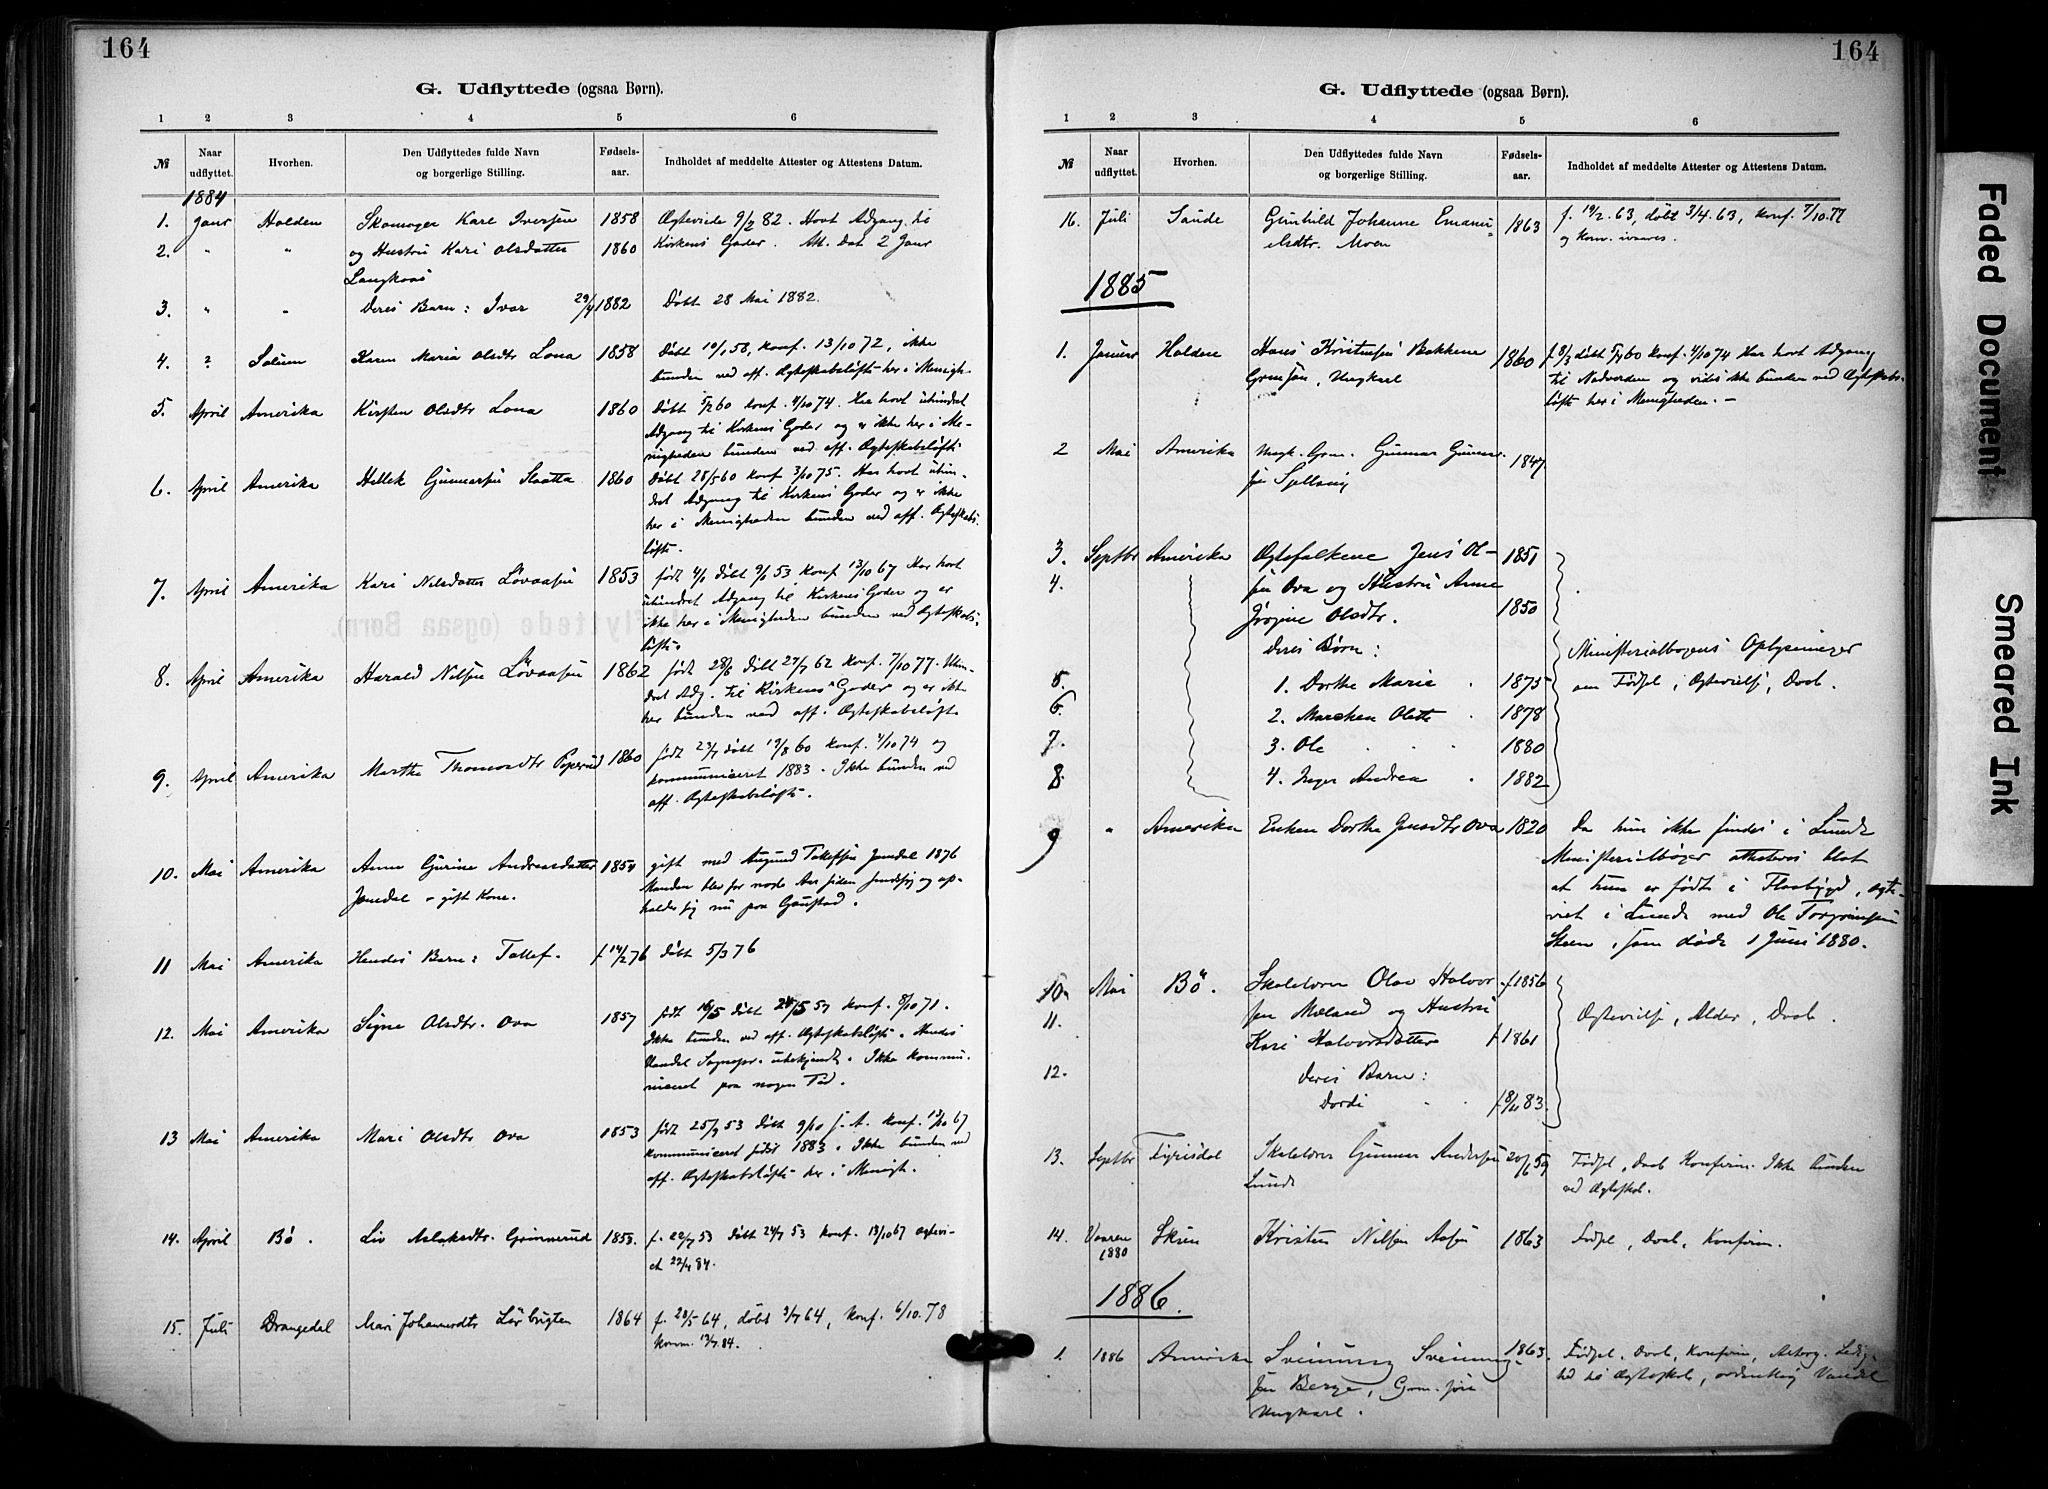 SAKO, Lunde kirkebøker, F/Fa/L0002: Ministerialbok nr. I 2, 1884-1892, s. 164